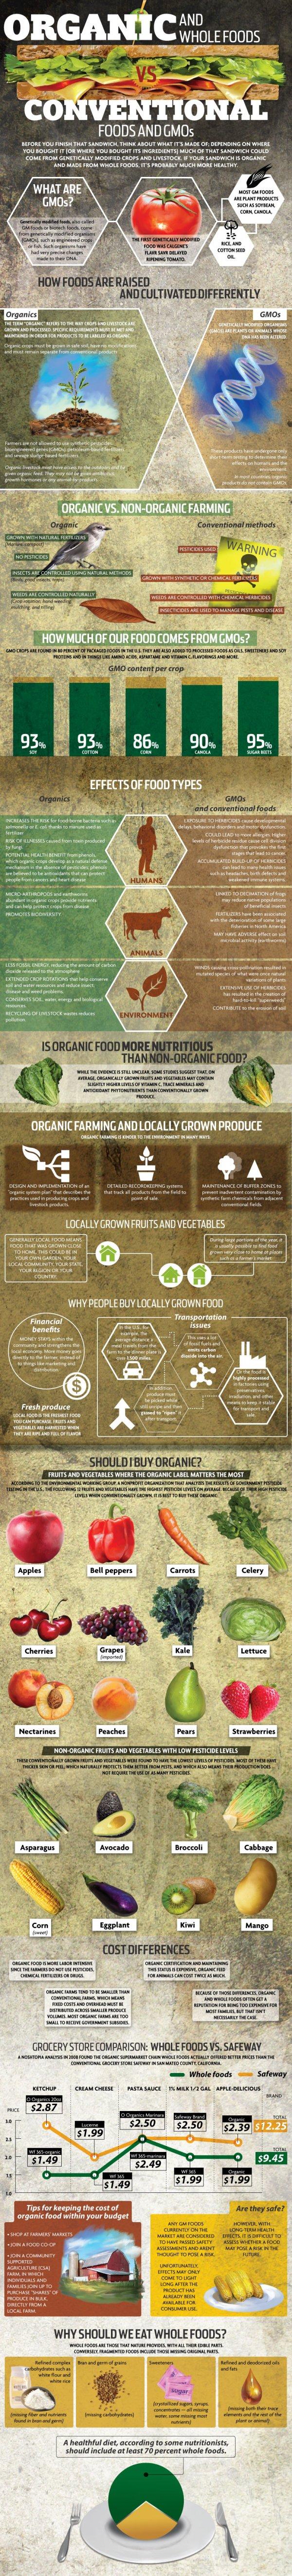 ecosystem,screenshot,ORGANIC,CONVENTIONAL,OODS,